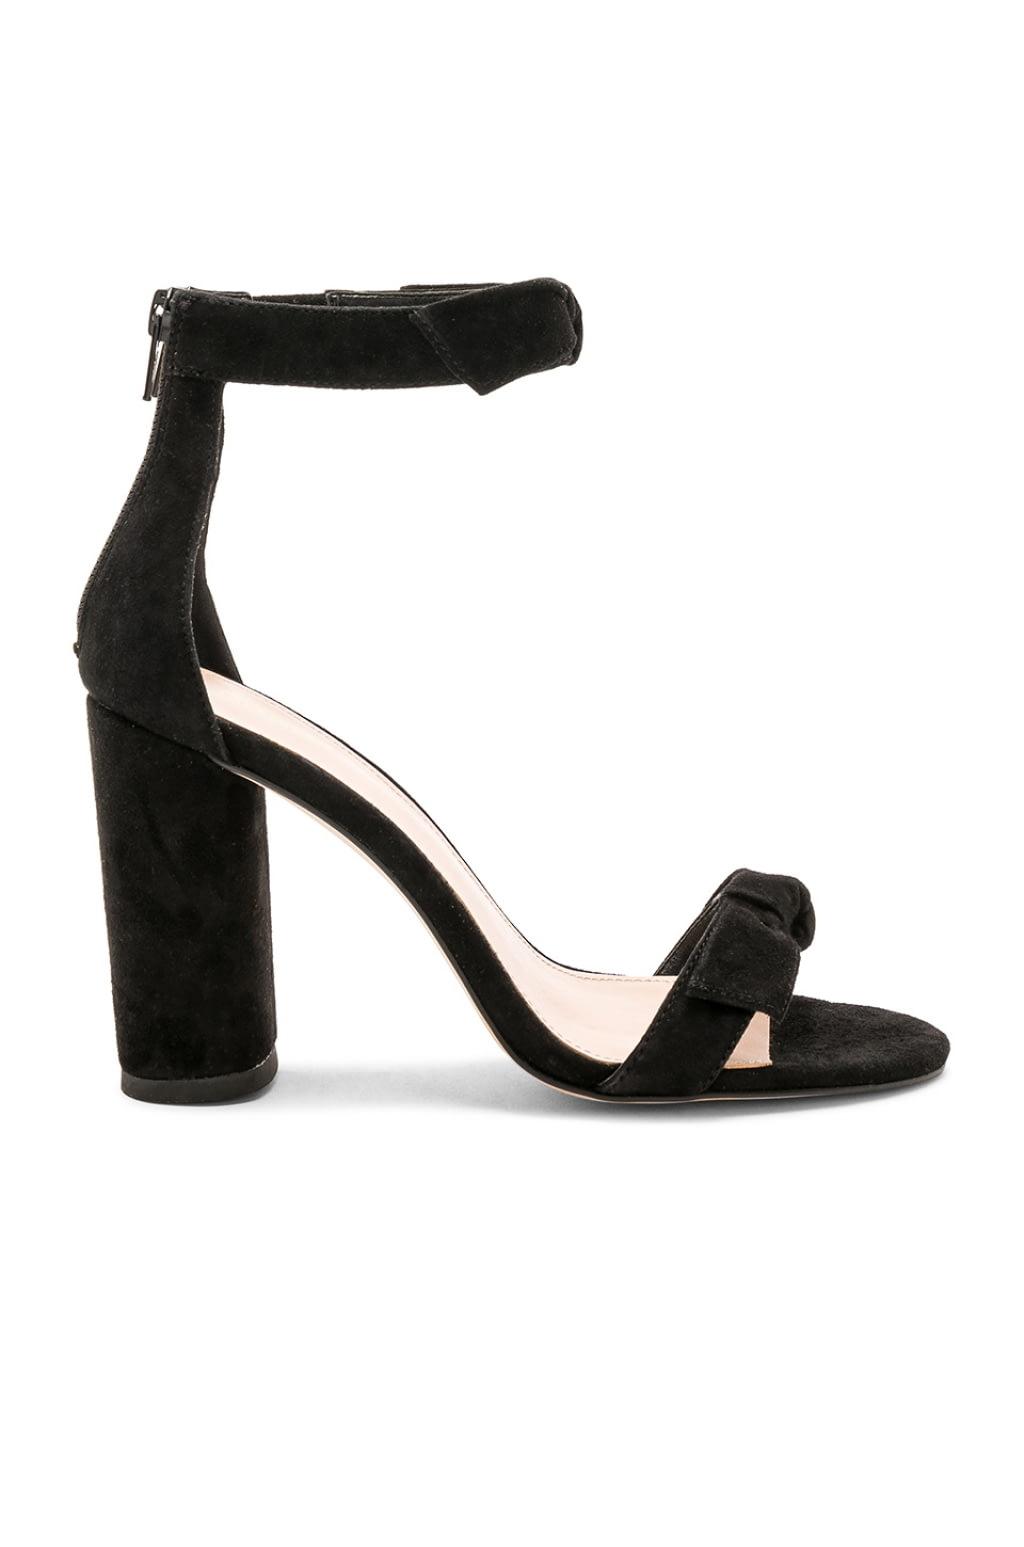 Buy Original Bcbgeneration Faedra Heel At Indonesia Bobobobo Atsthelabel Eeva Black Top